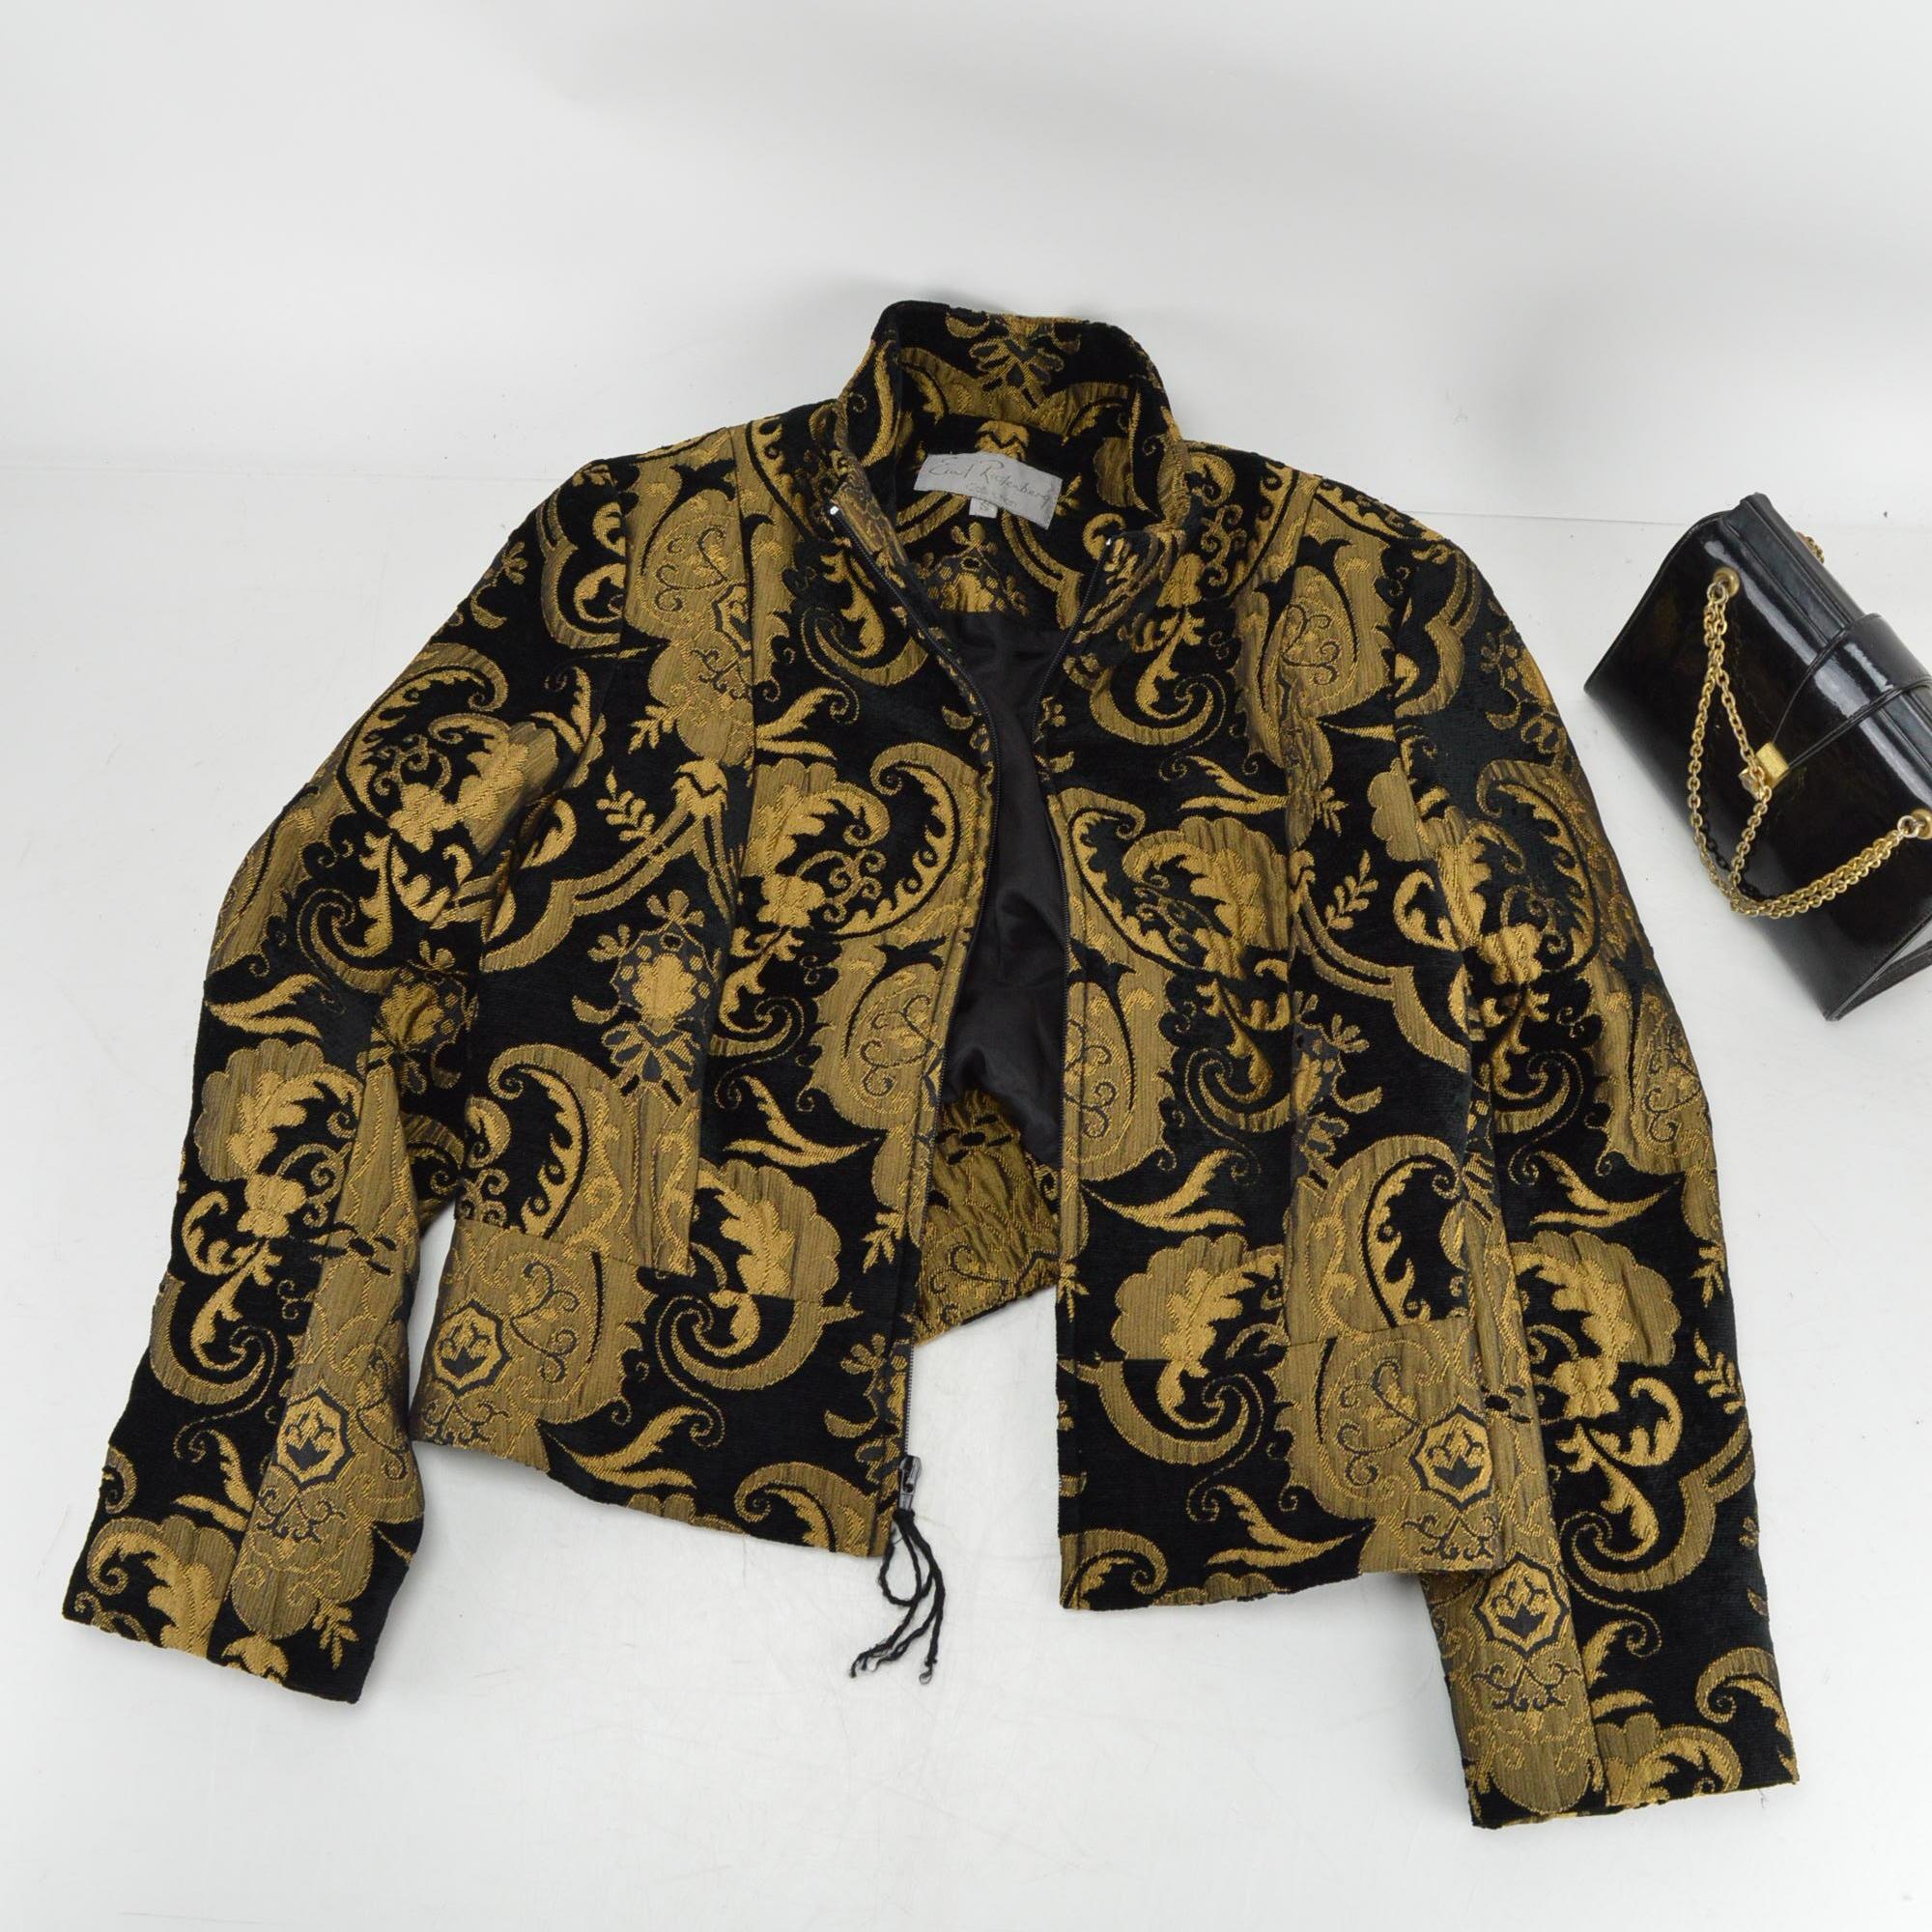 Vintage Earl Rosenberg Collection Jacket and Patent Leather Handbag